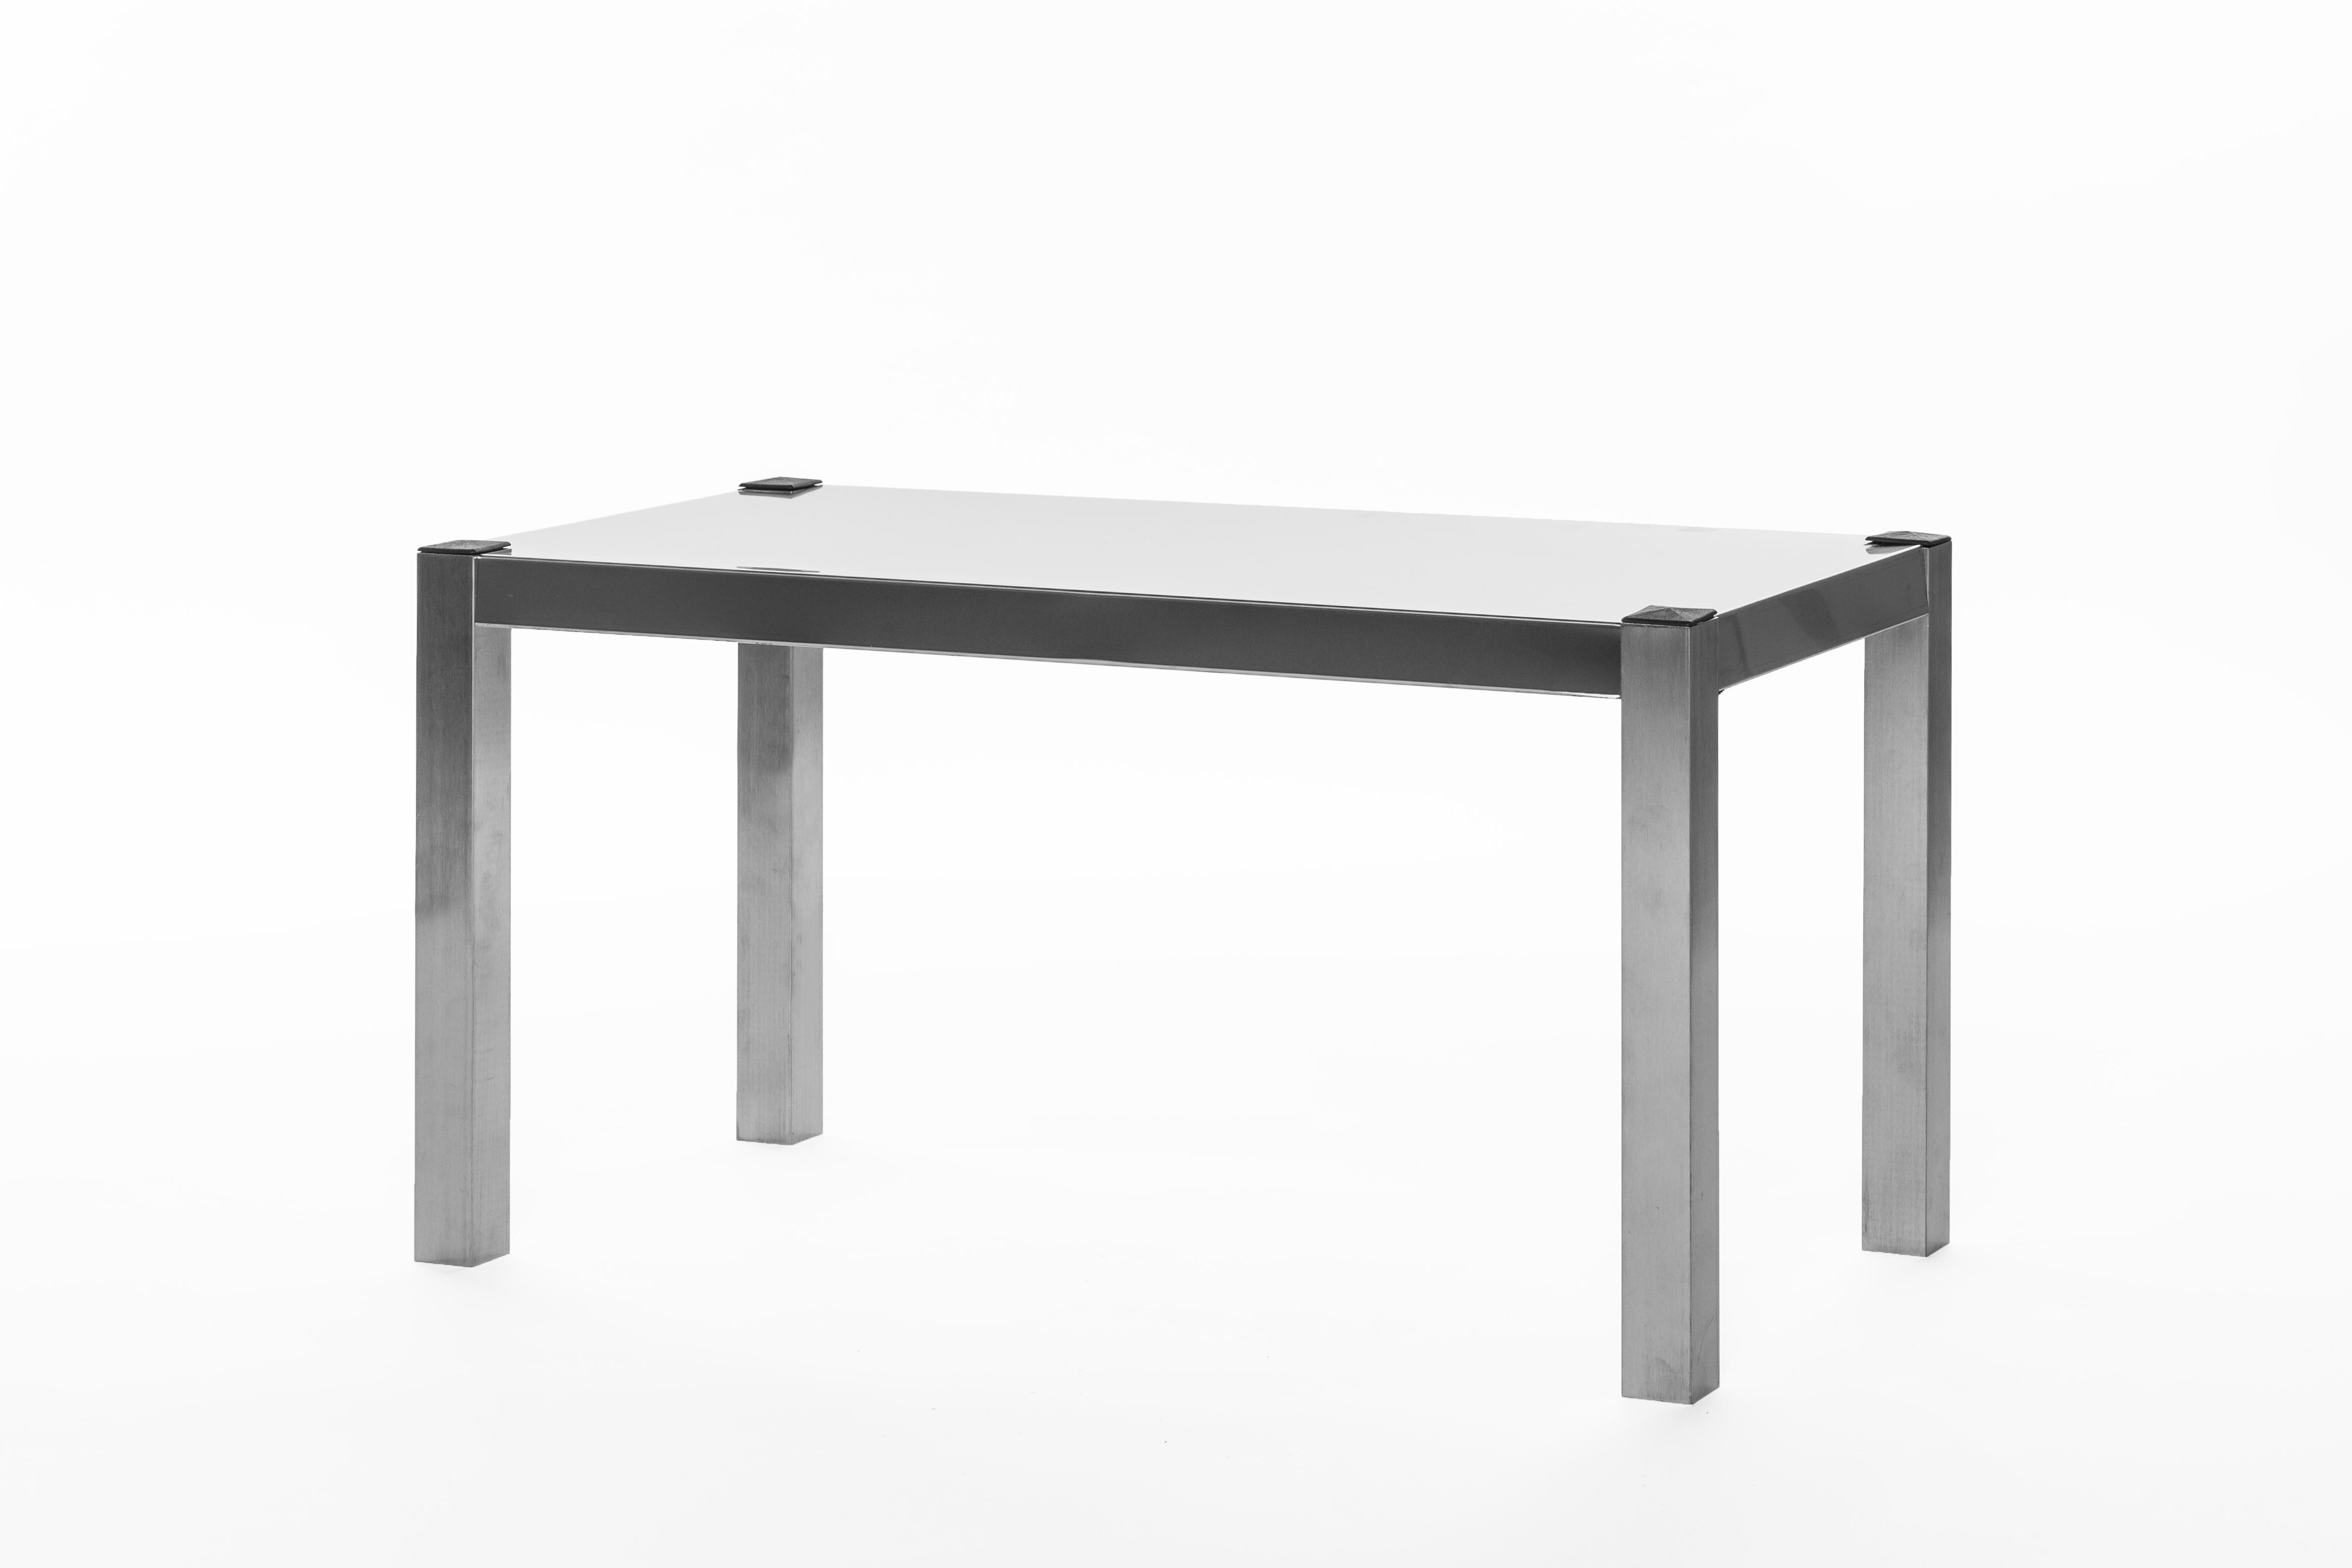 Unterkategorie - Tischaufsatzbord